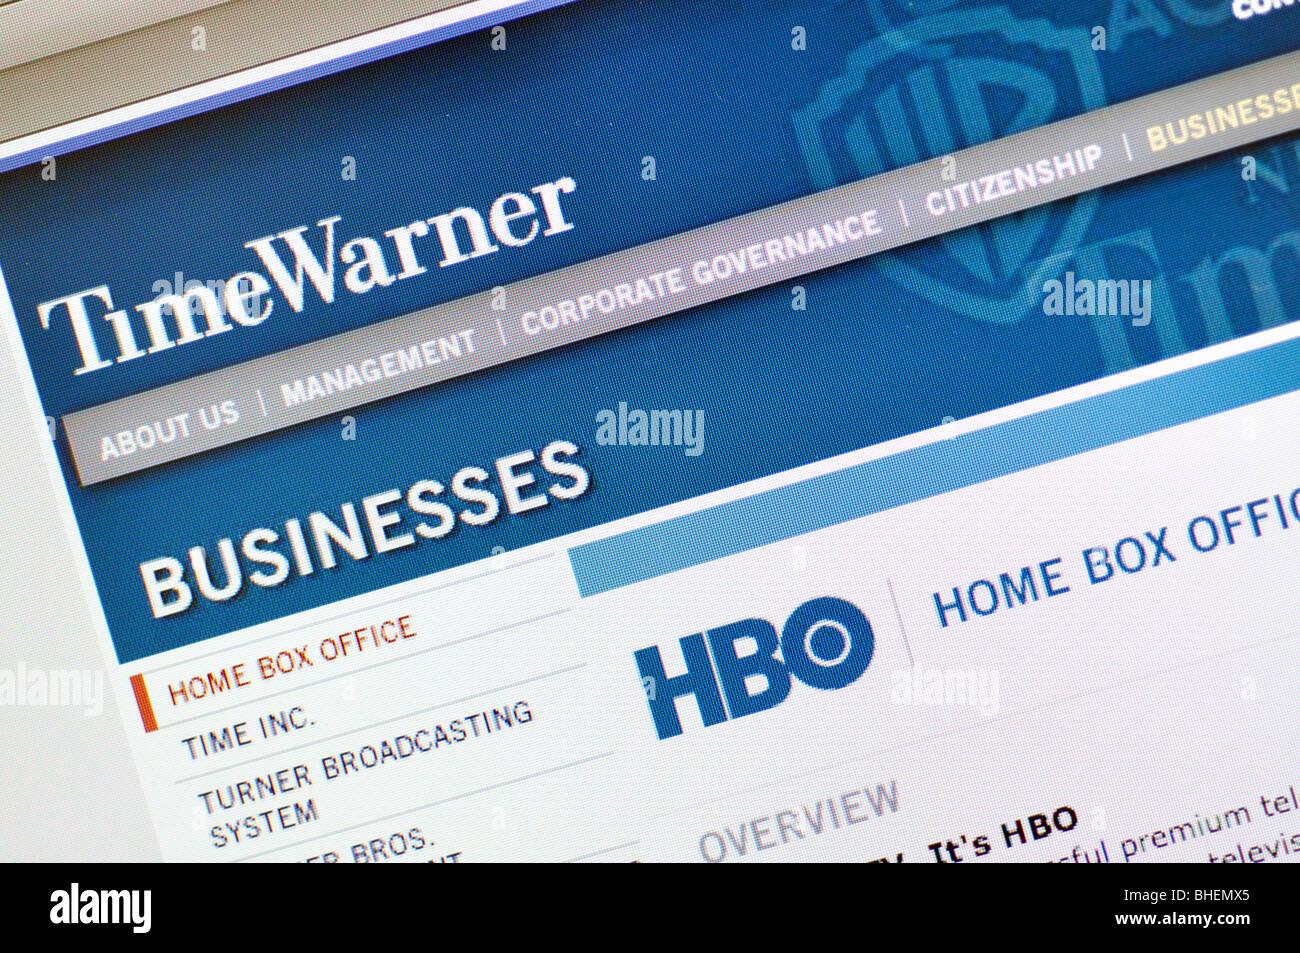 Timewarner Internet Cable Tv Provider Stock Photos & Timewarner ...